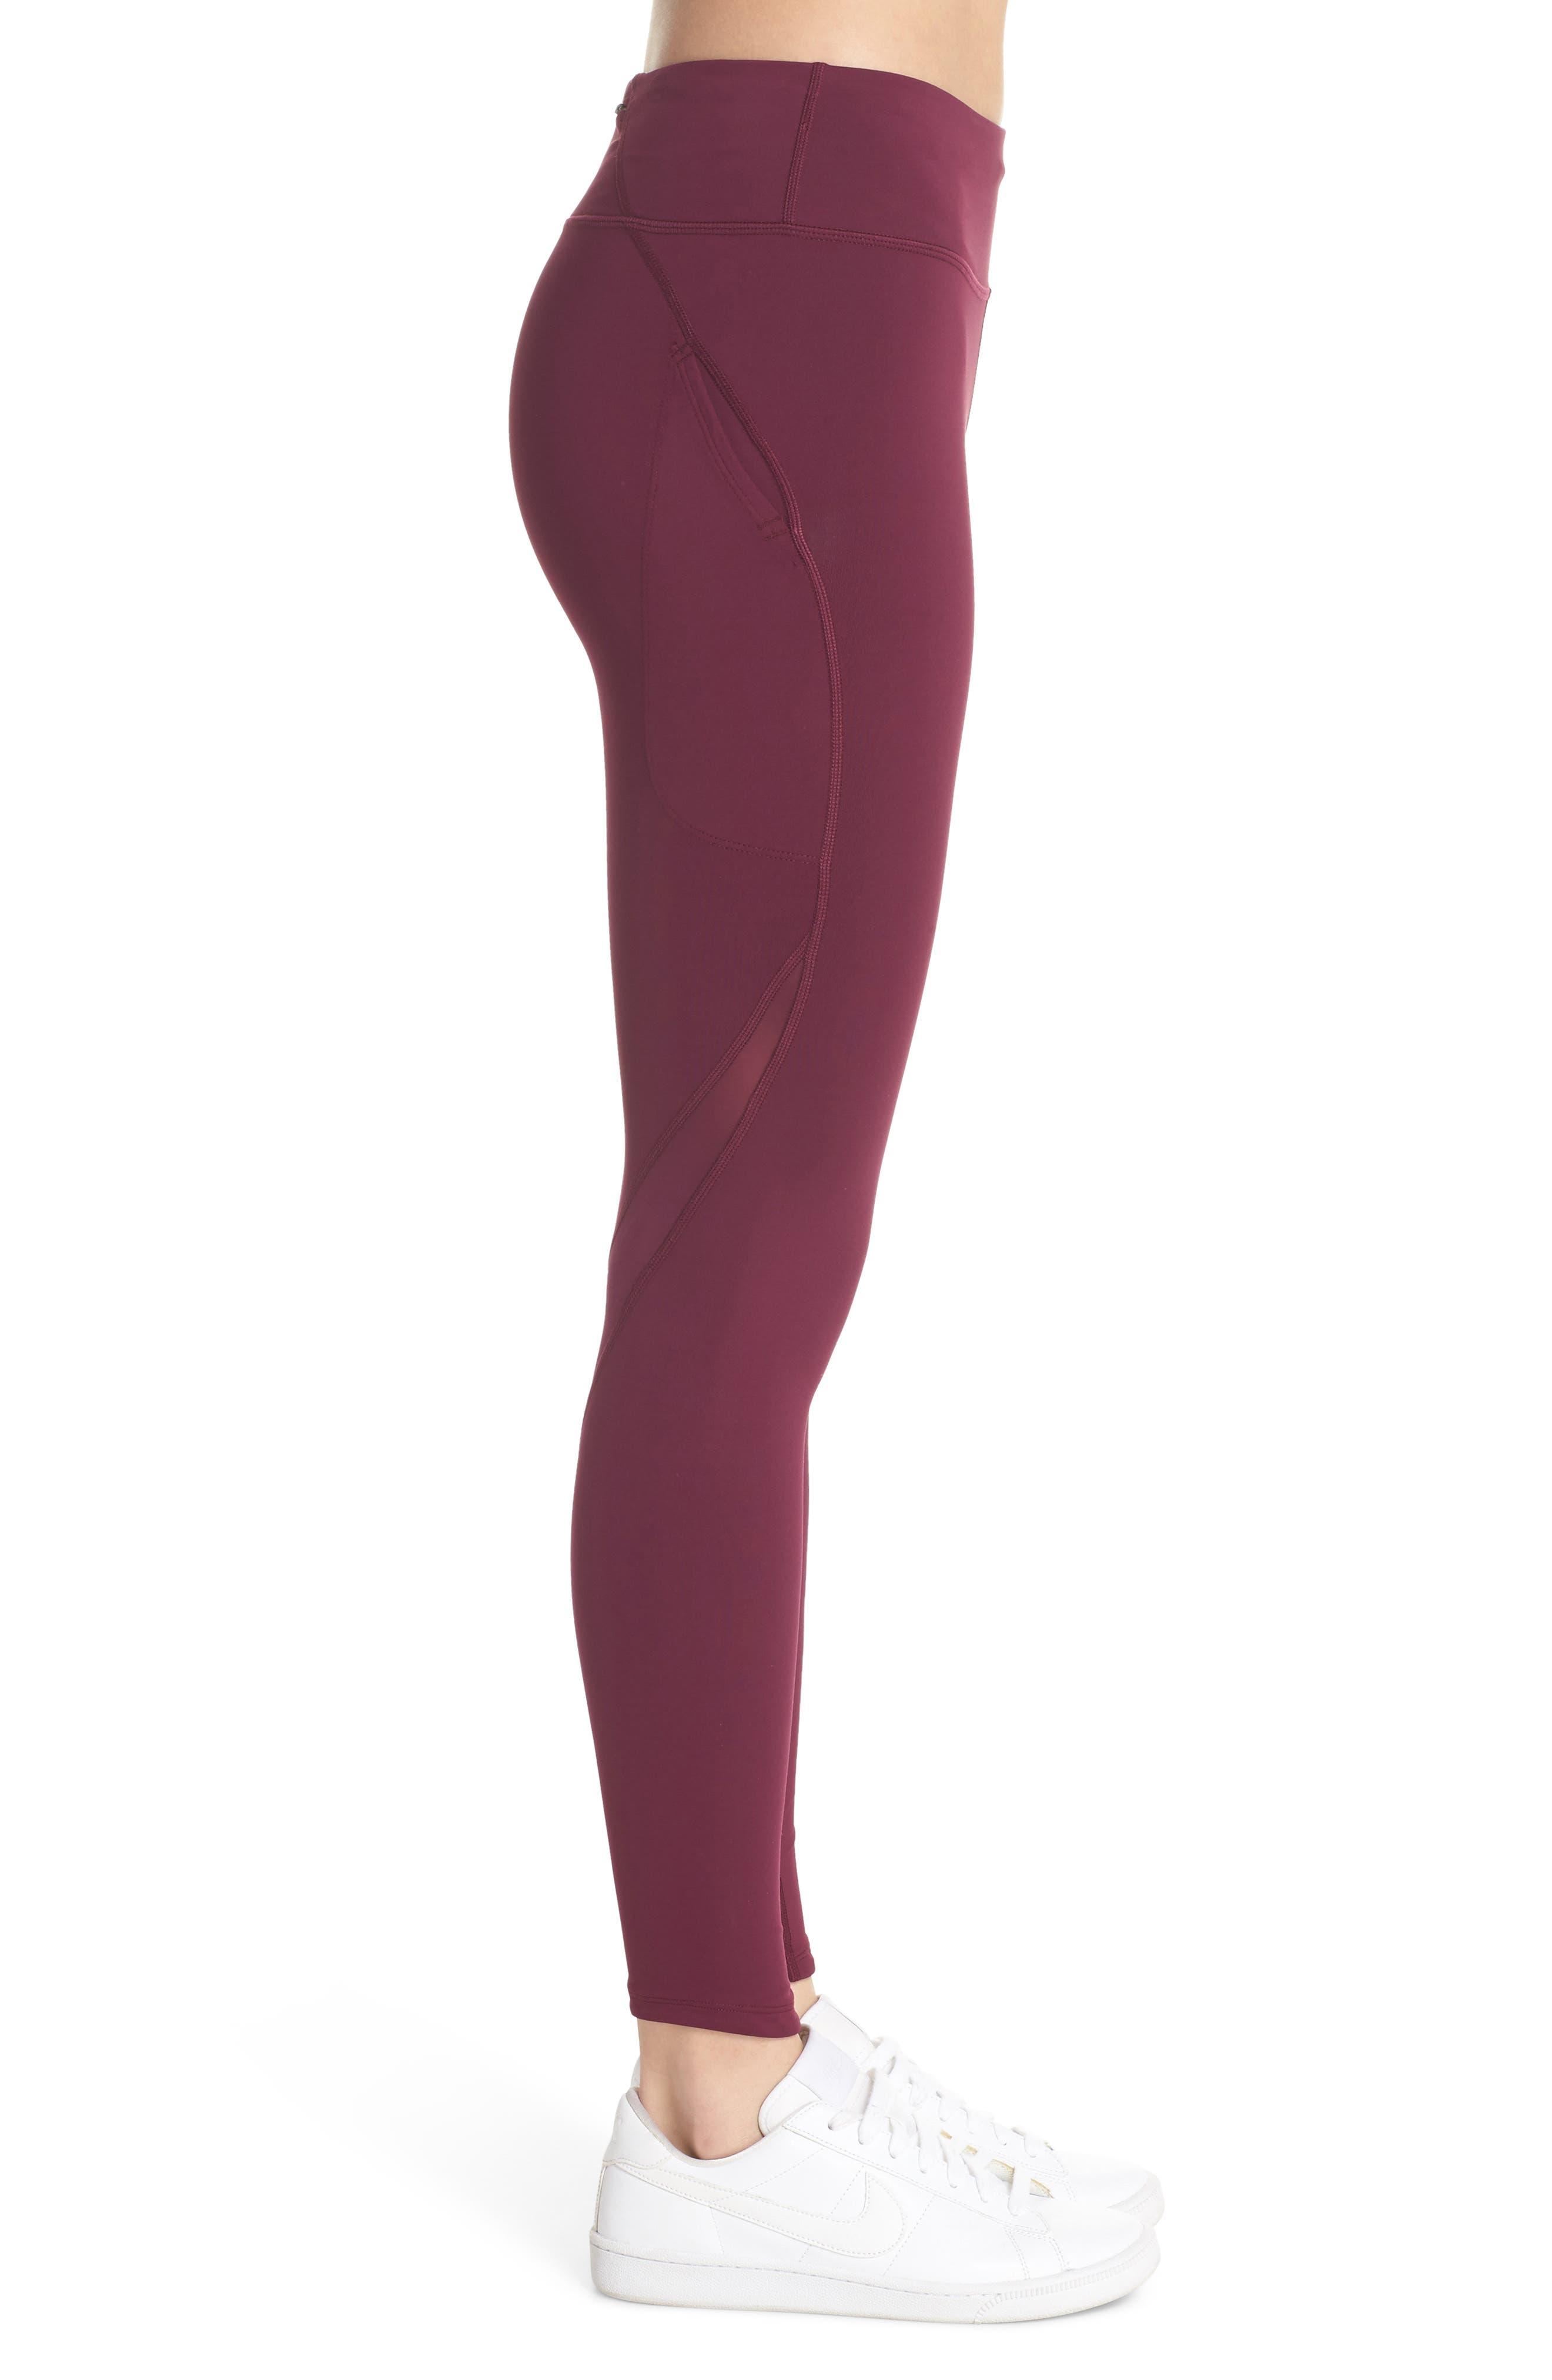 NikeLab Collection Dri-FIT Women's Tights,                             Alternate thumbnail 3, color,                             BORDEAUX